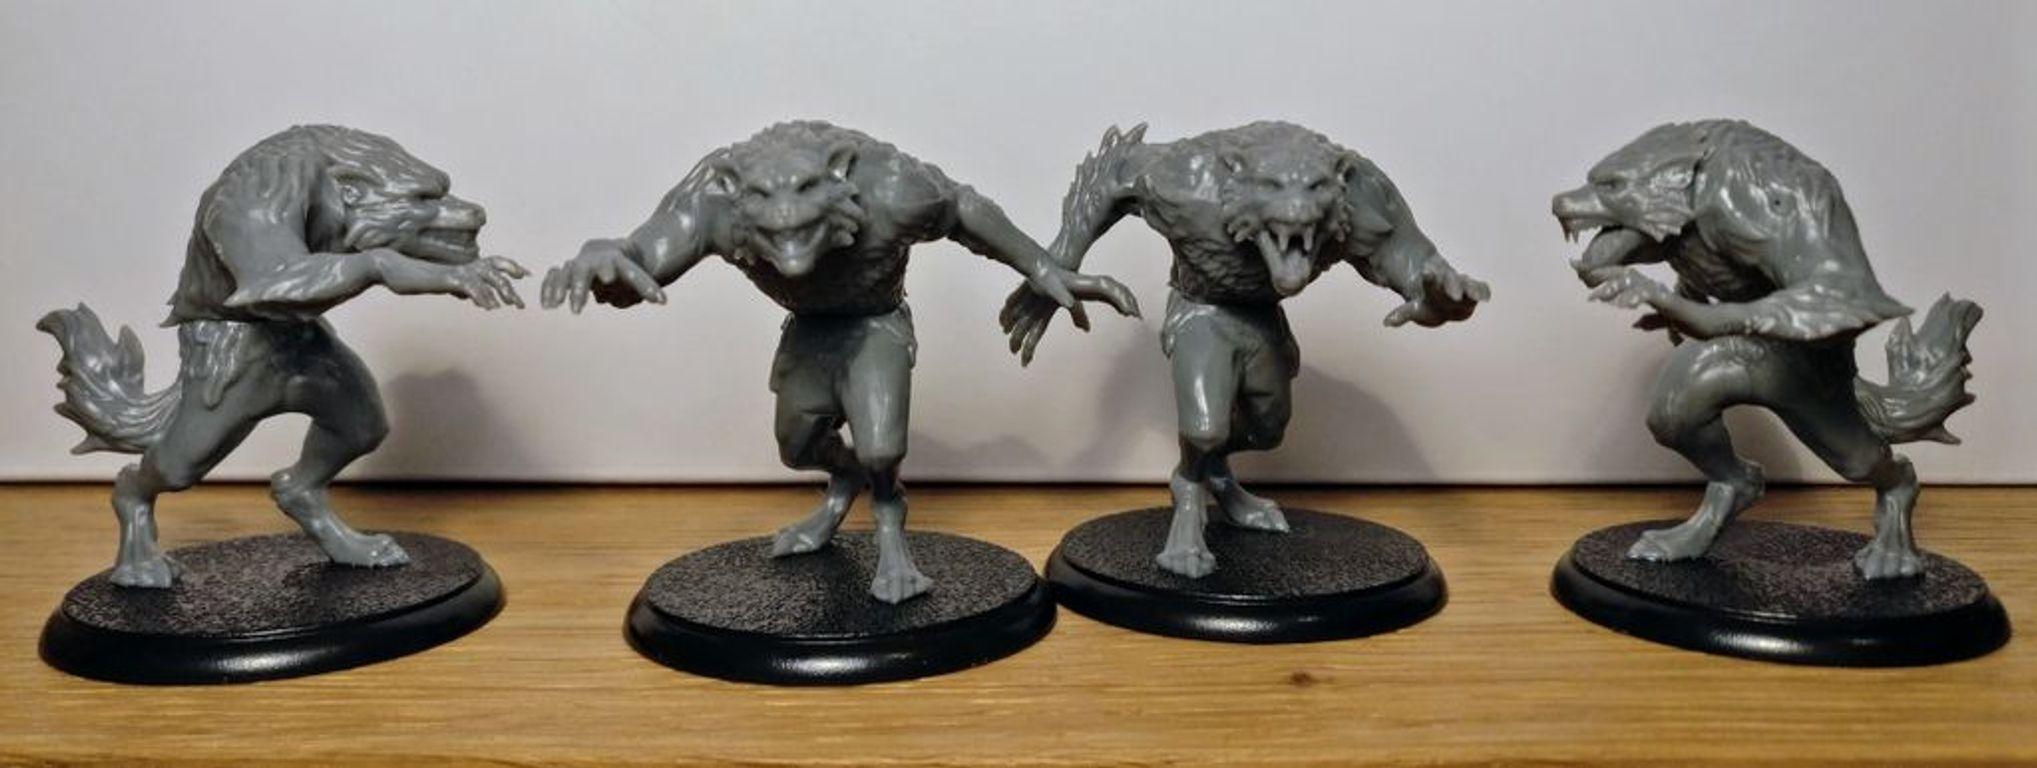 Shadows of Brimstone: Werewolf Feral Kin Mission Pack miniaturas